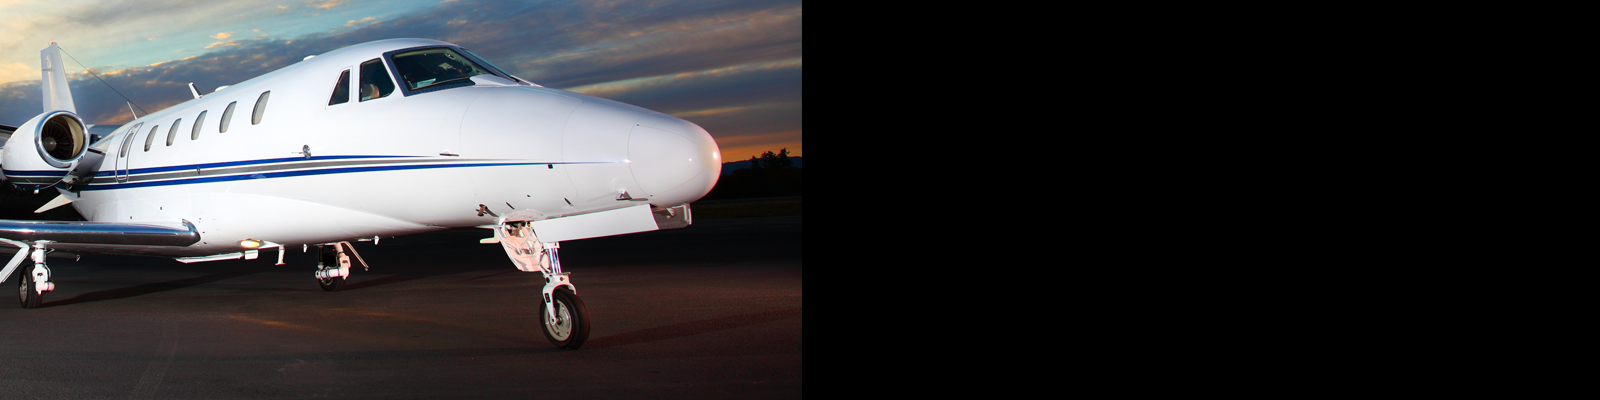 Airframes